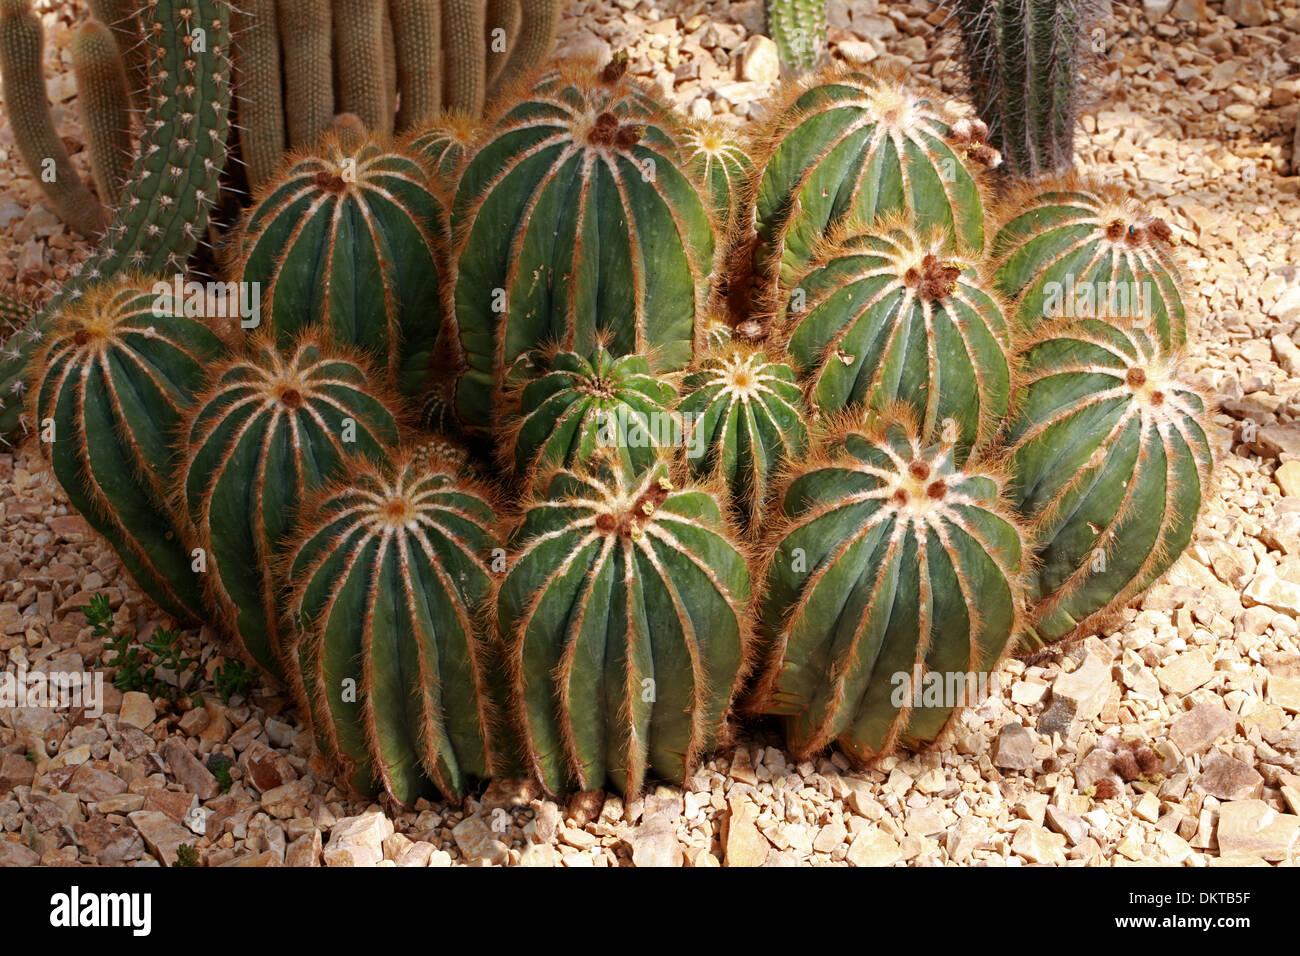 Cactus, Parodia magnifica, Cactaceae. Southern Brazil, Uruguay, South America. Stock Photo